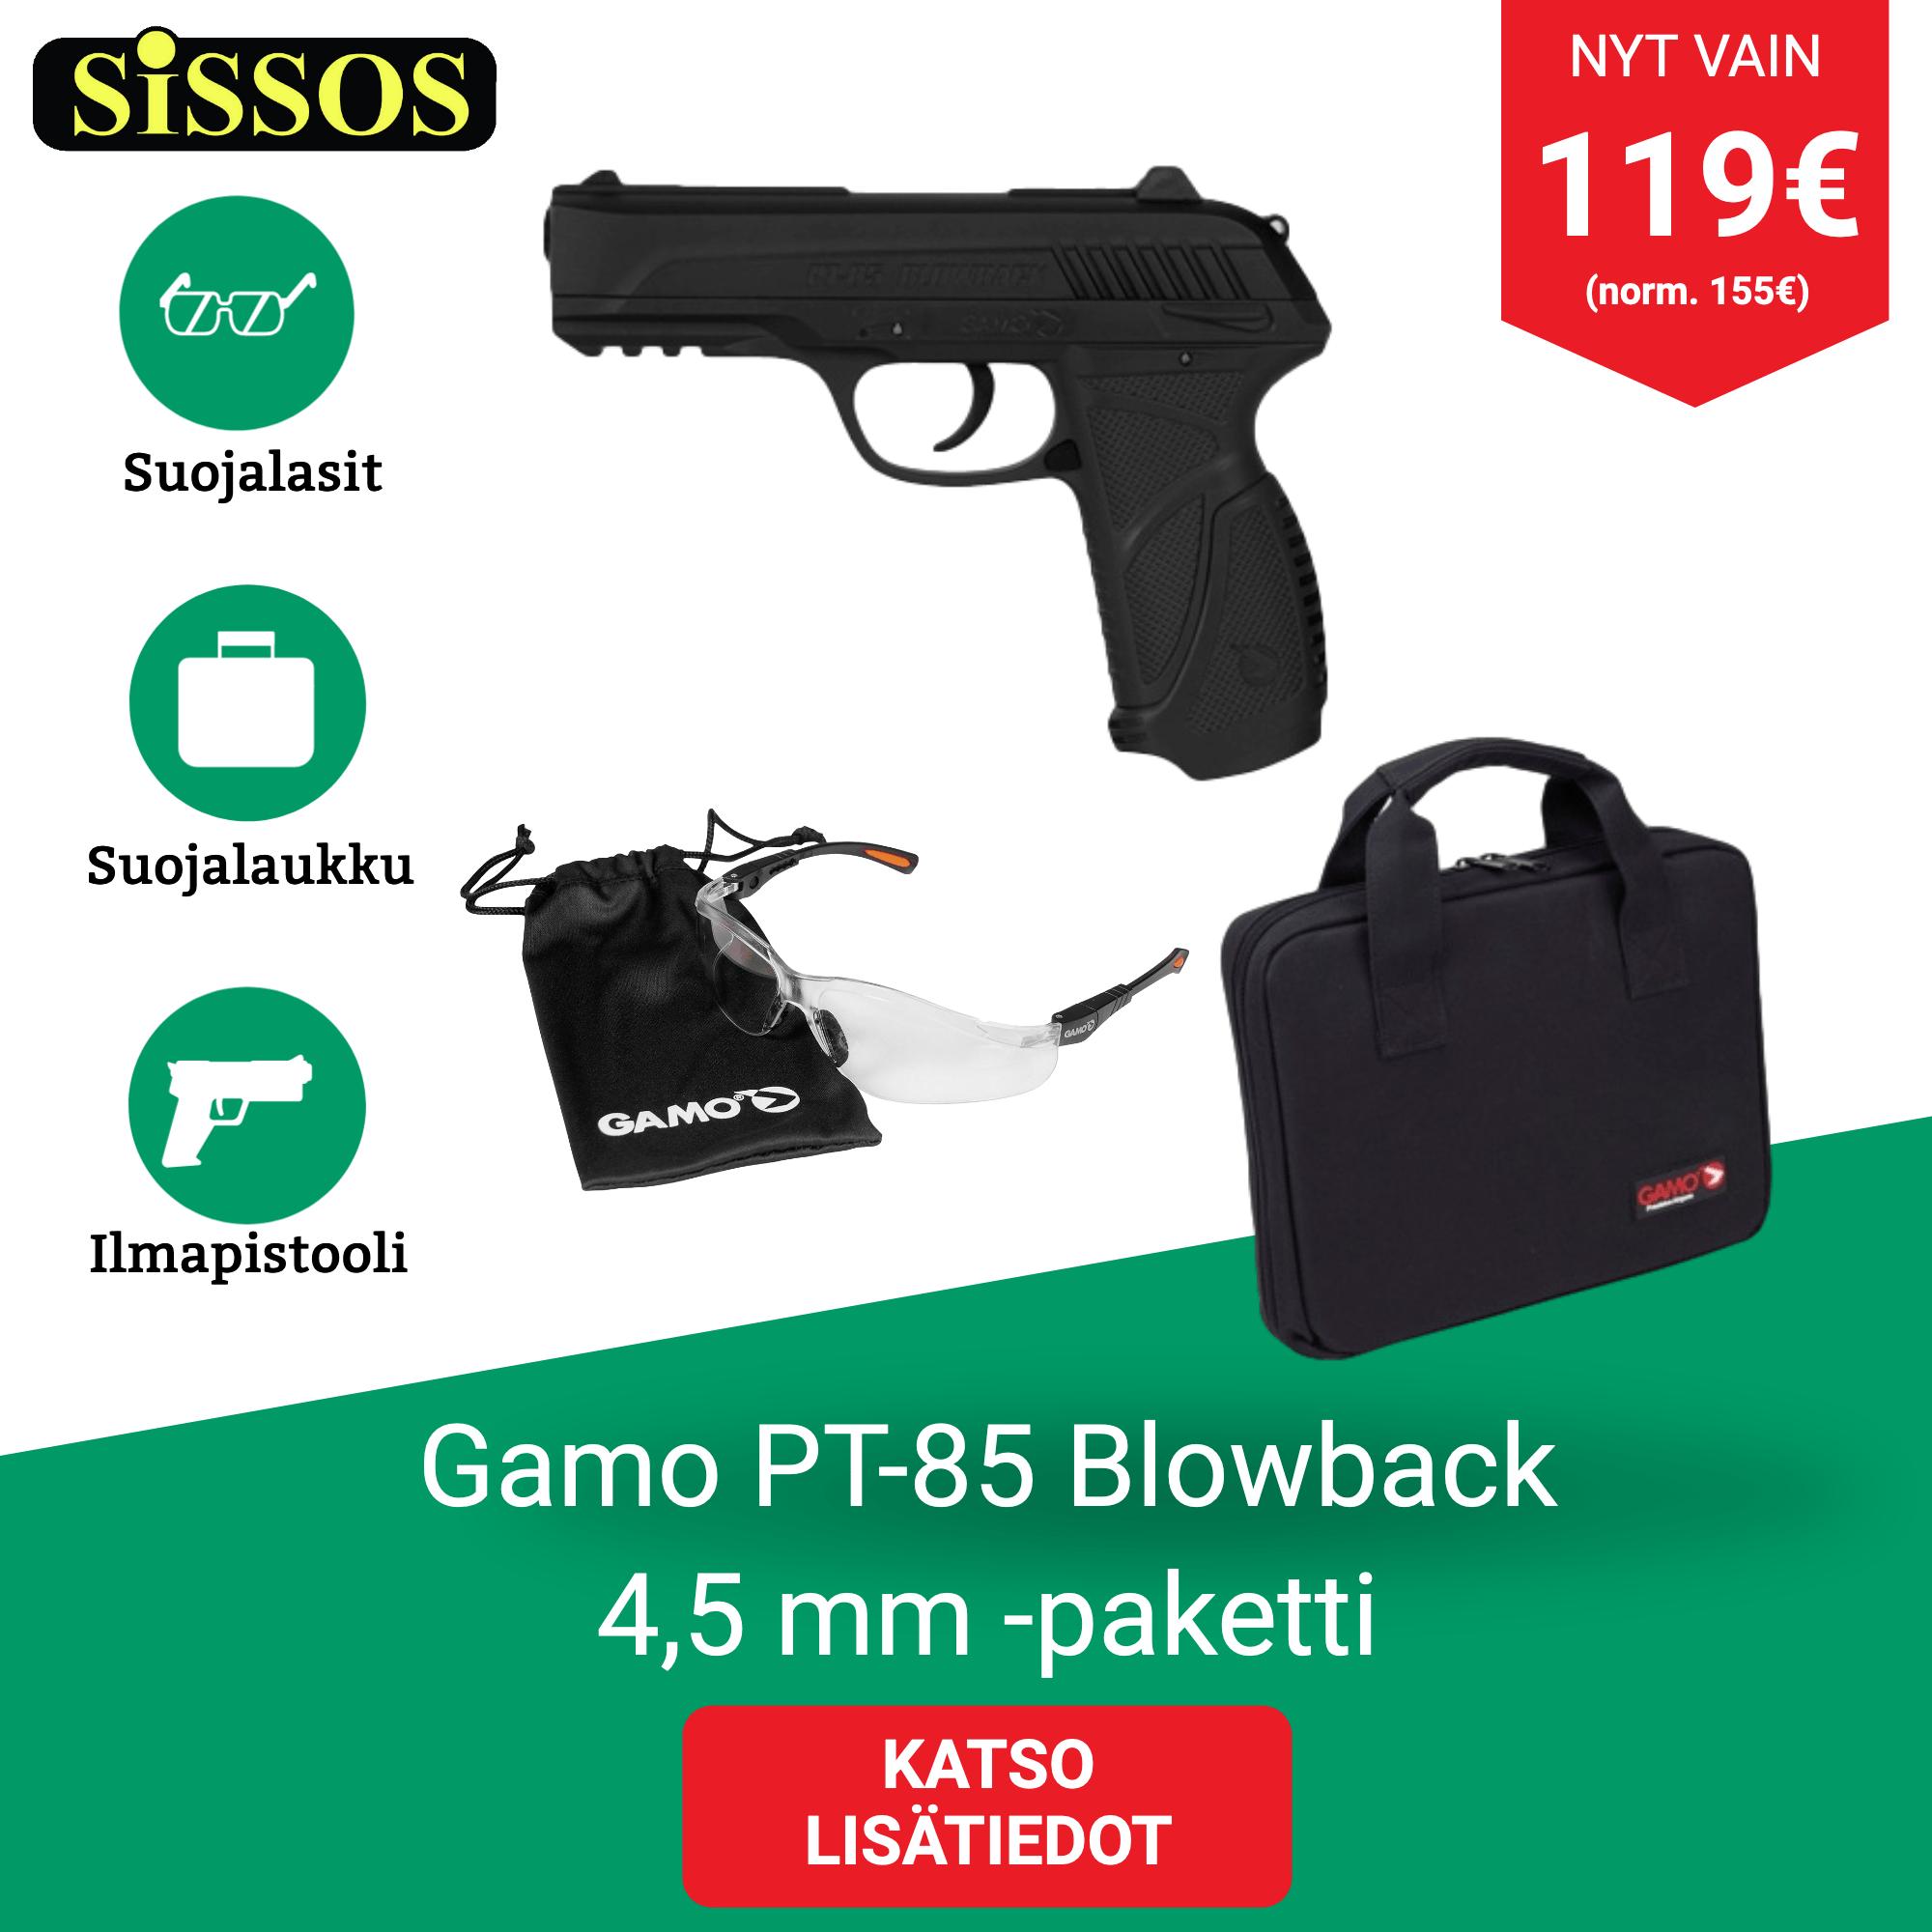 Gamo PT-85 Blowback -paketti